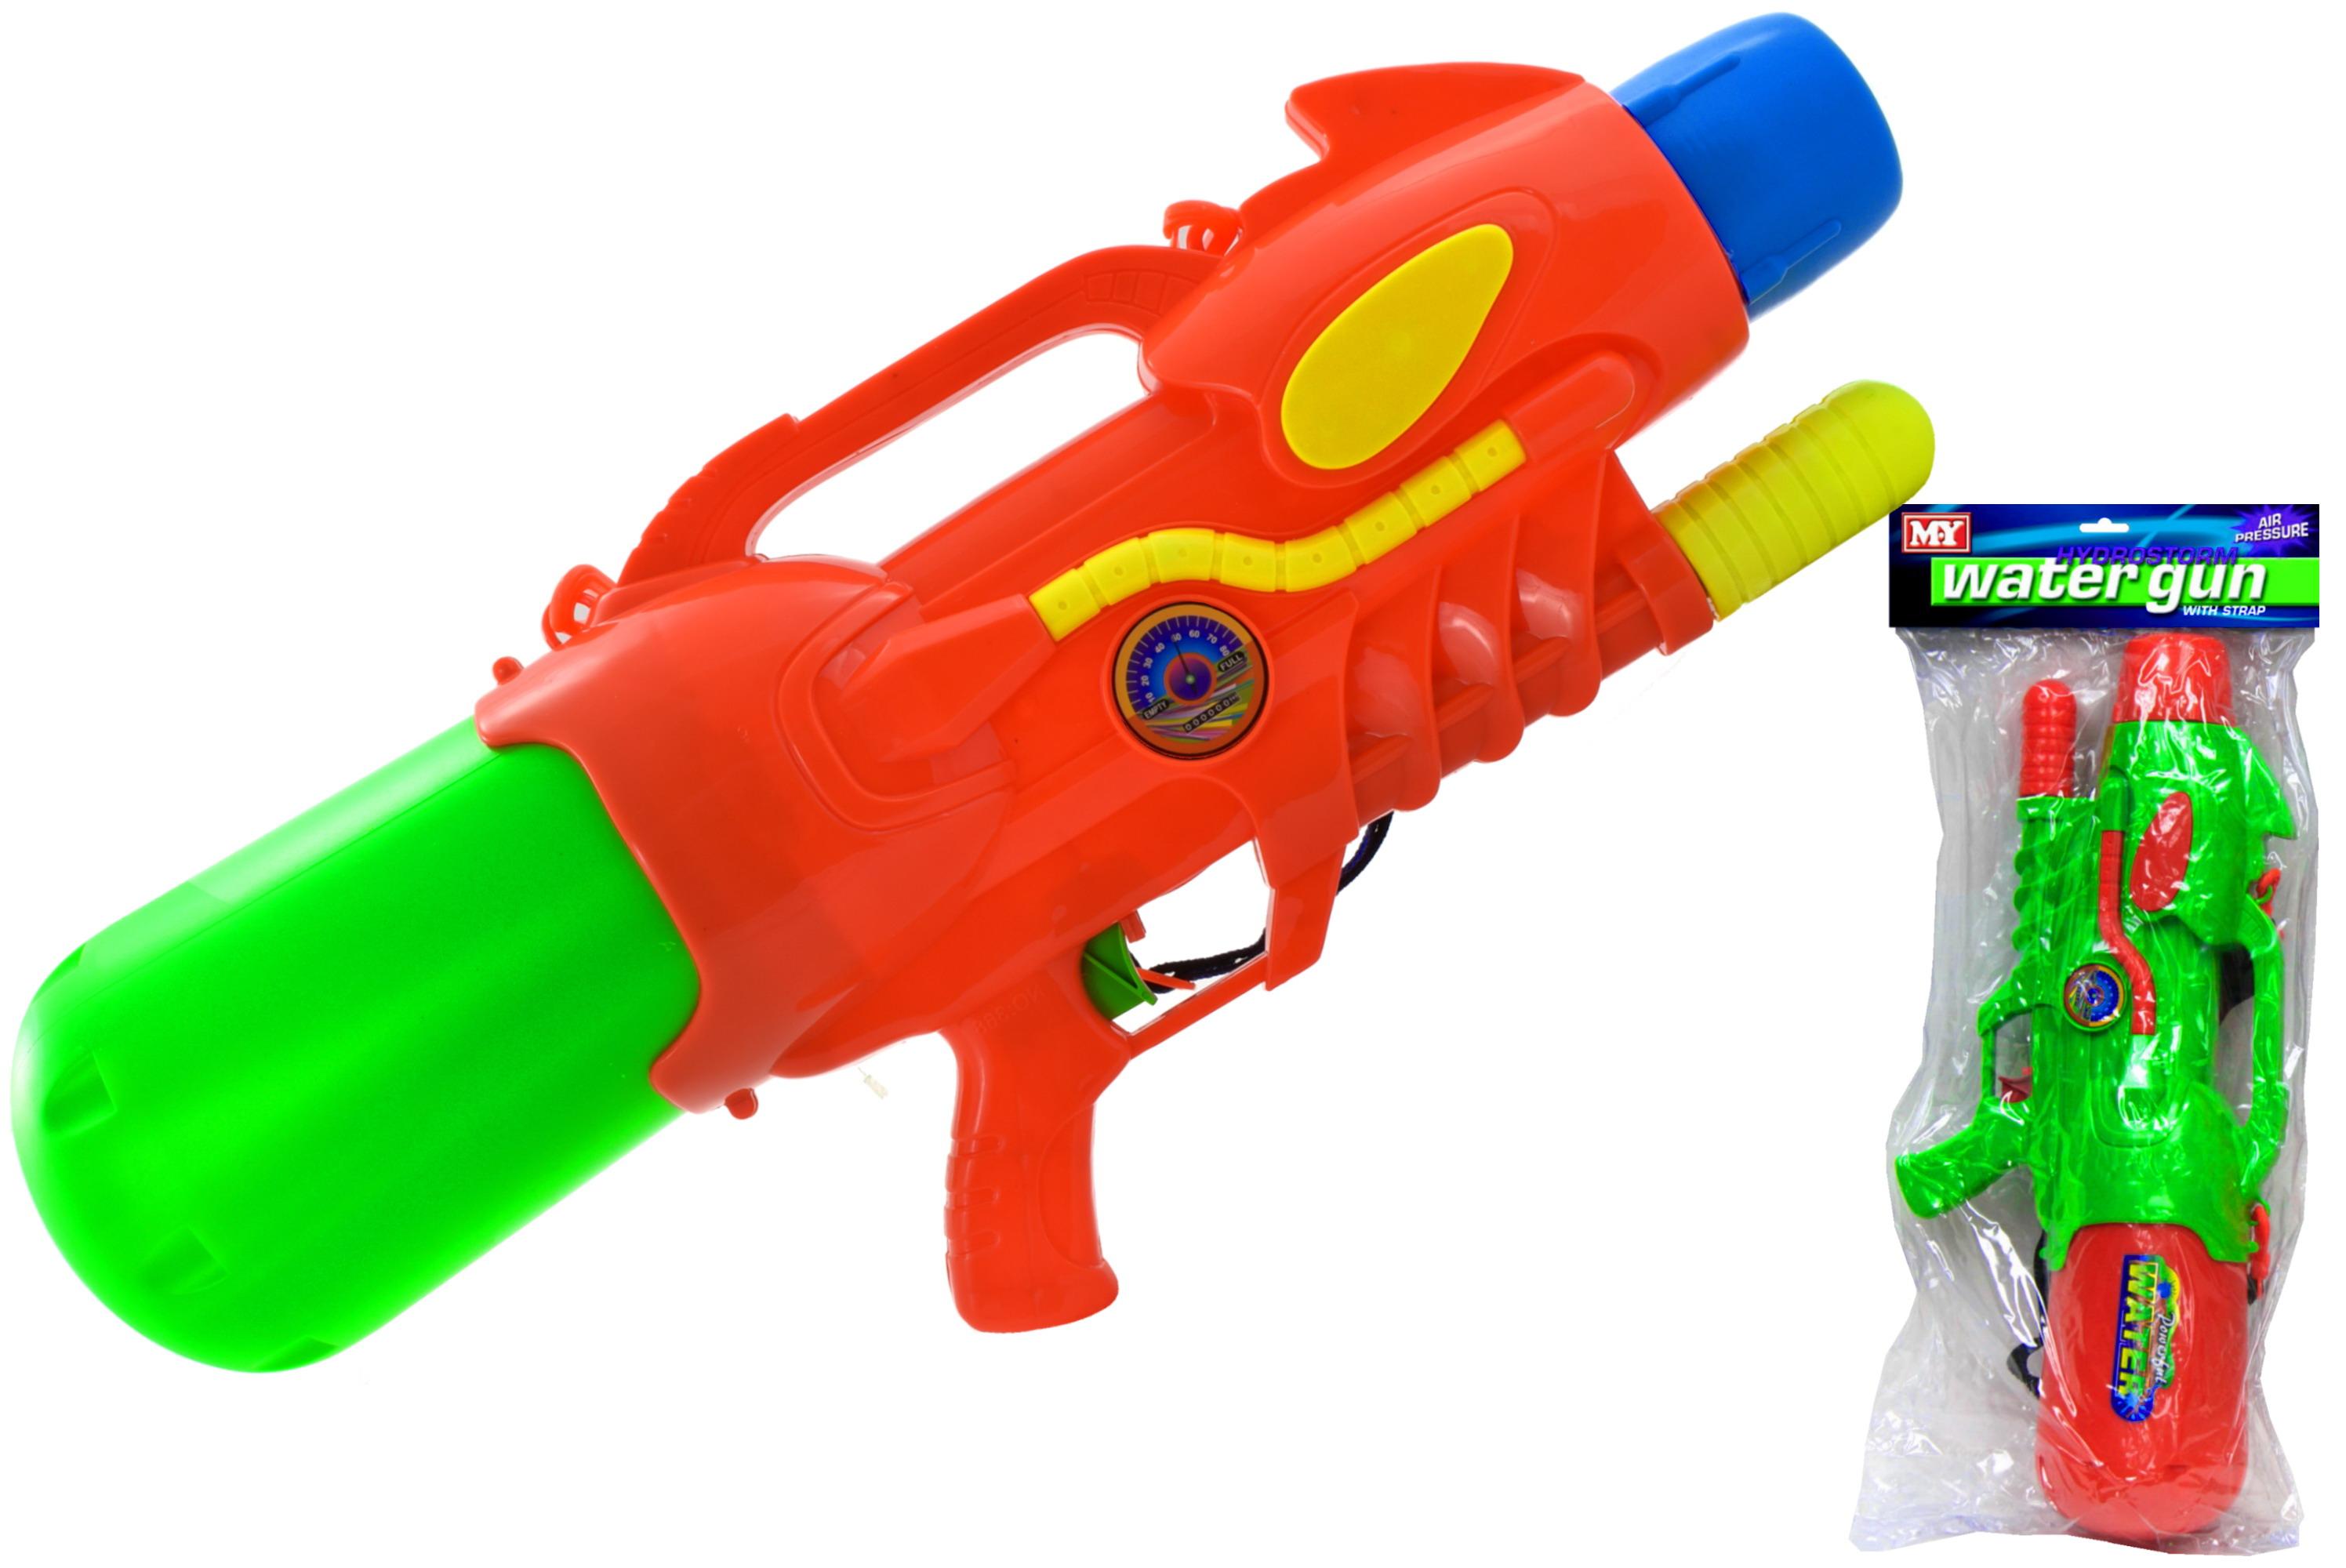 60cm Air Pressure Water Gun With Strap In Pvc Bag